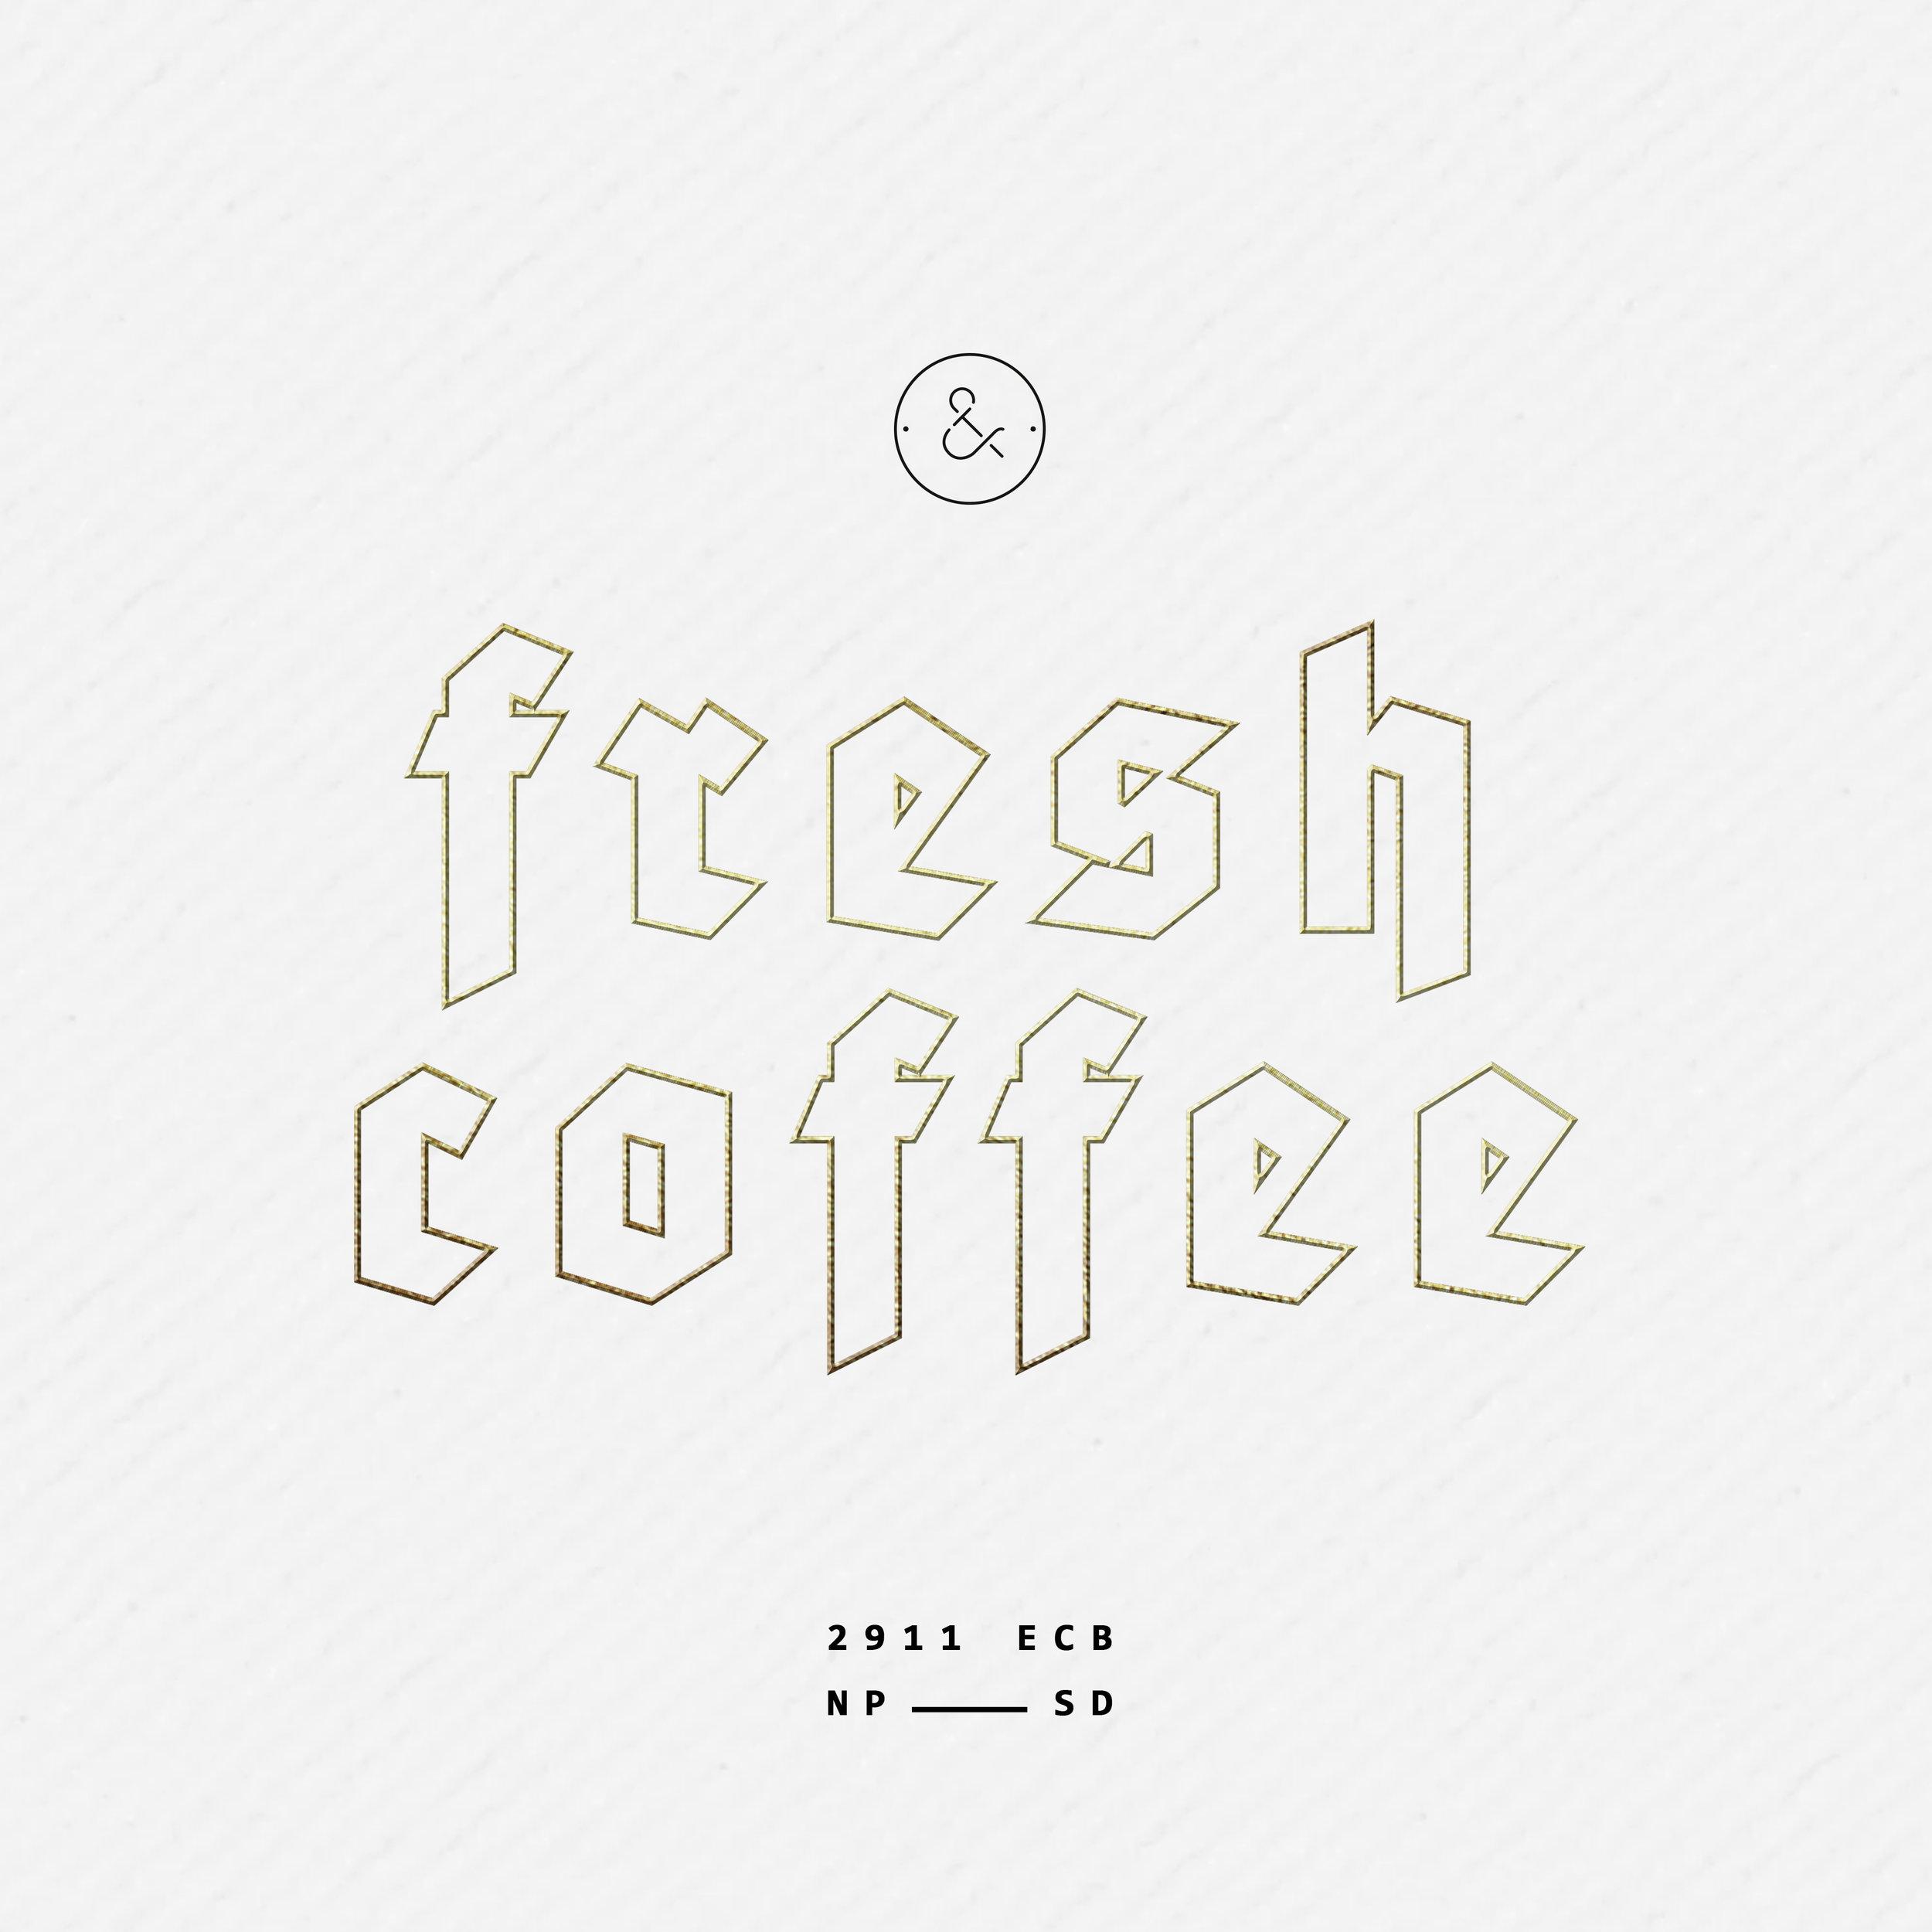 fresh coffee box design gold foil packaging minimal modern monochrome